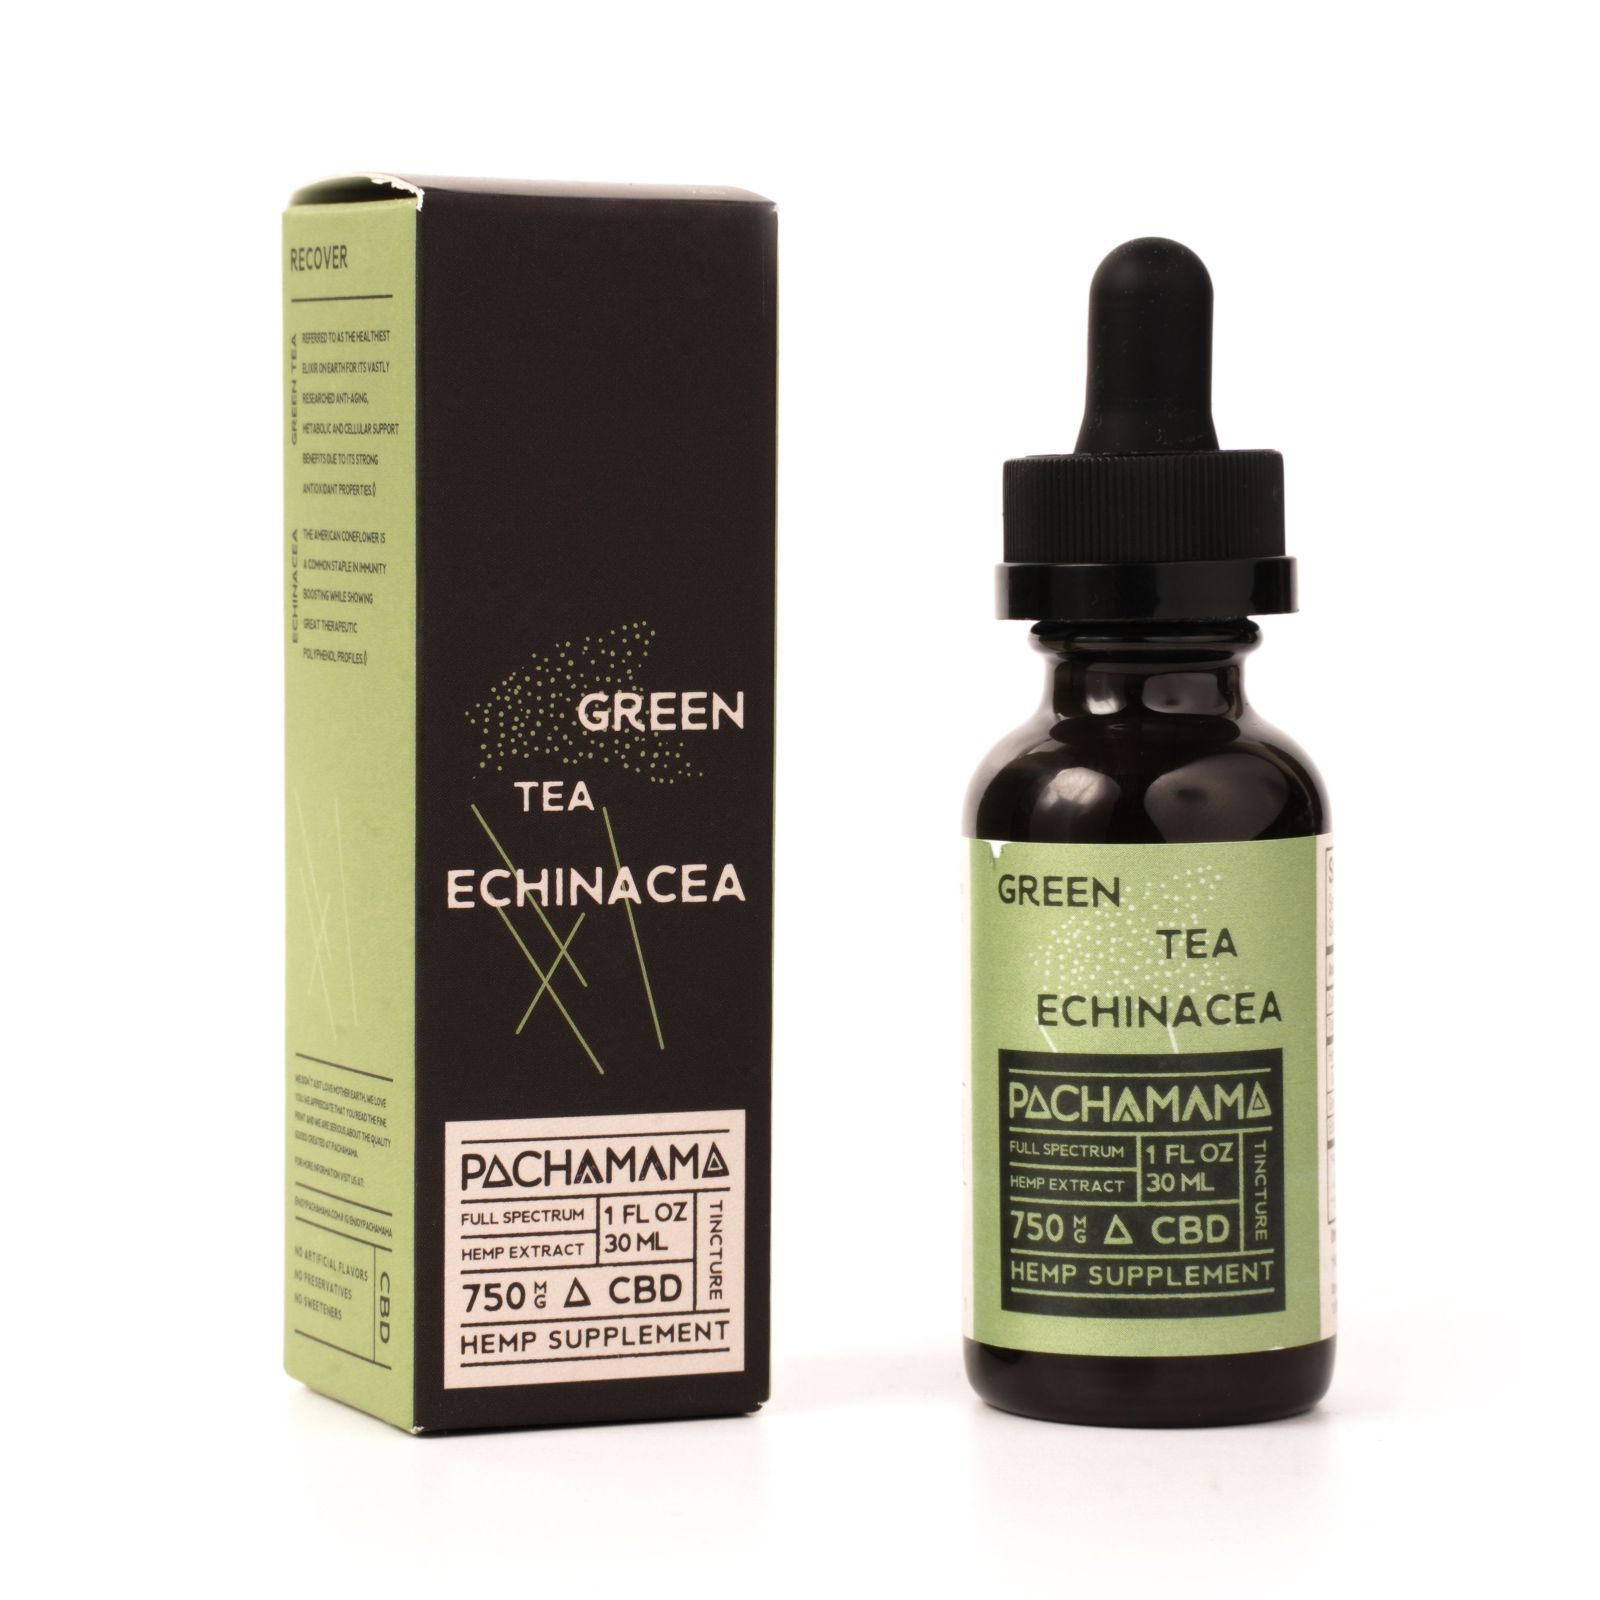 CBD Oil Green Tea Echinacea 750 mg 1 fl. oz. (30 mL)